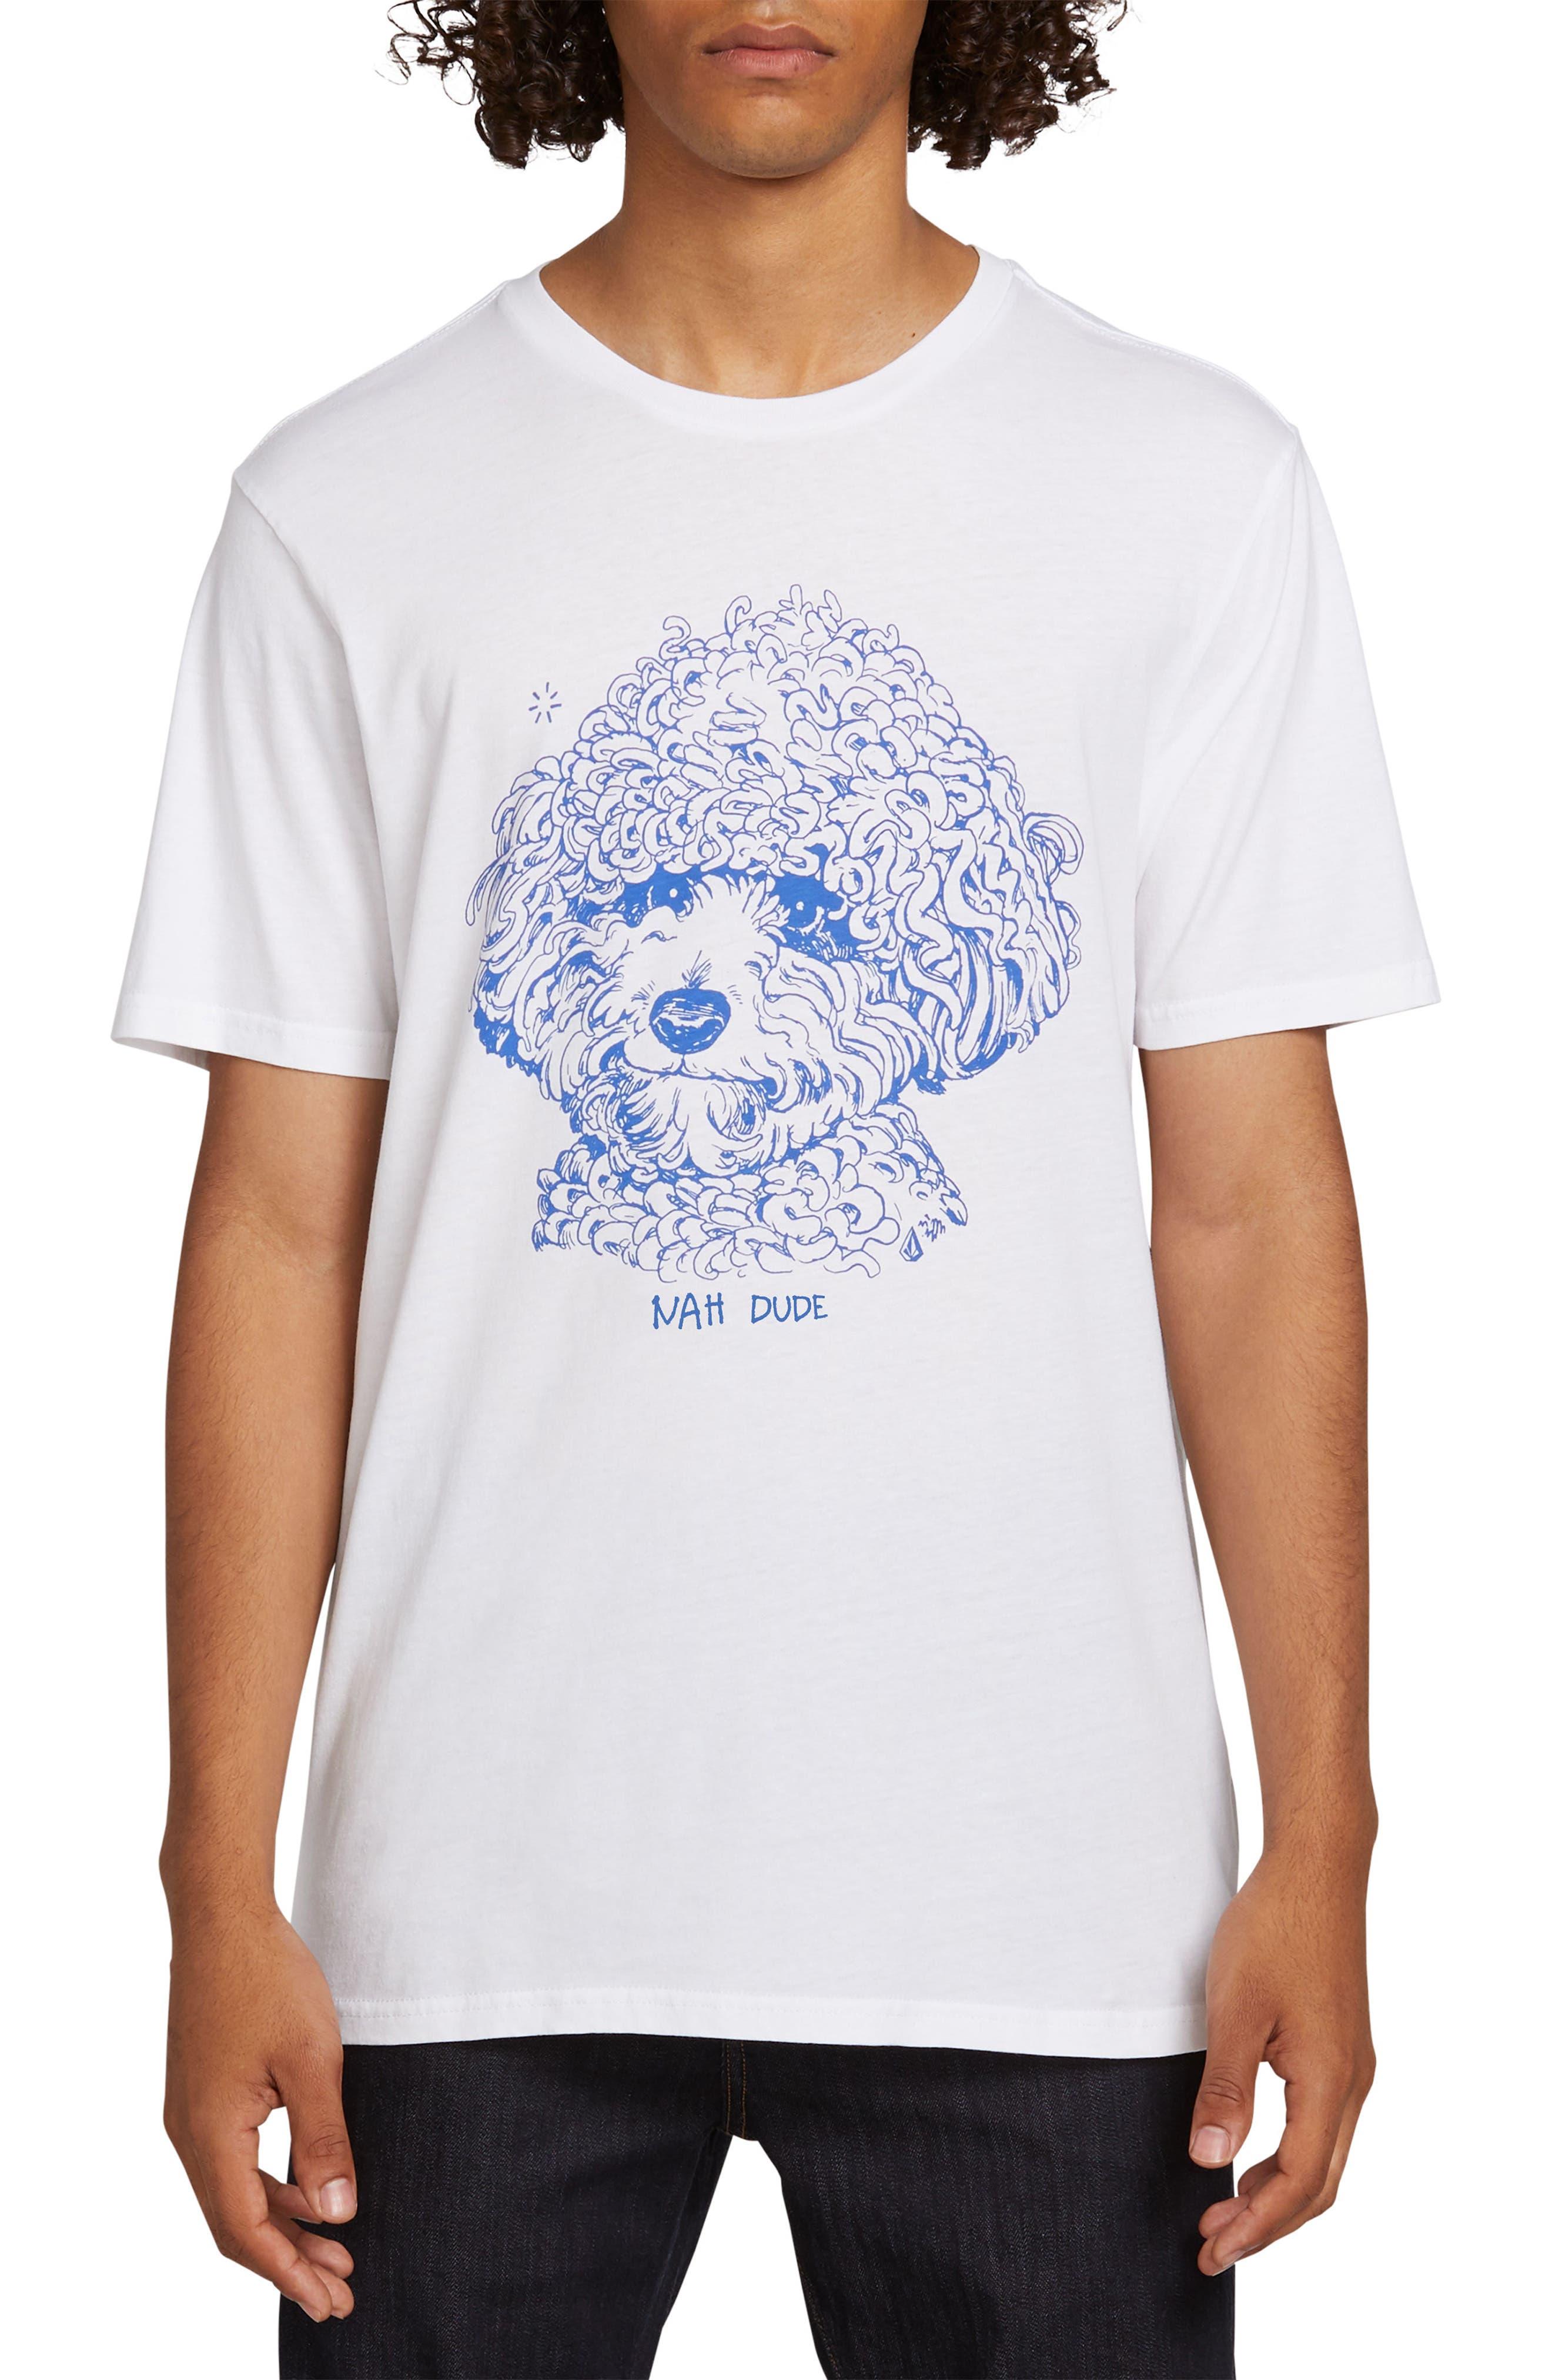 Volcom Travis Millard Dog T-Shirt, White